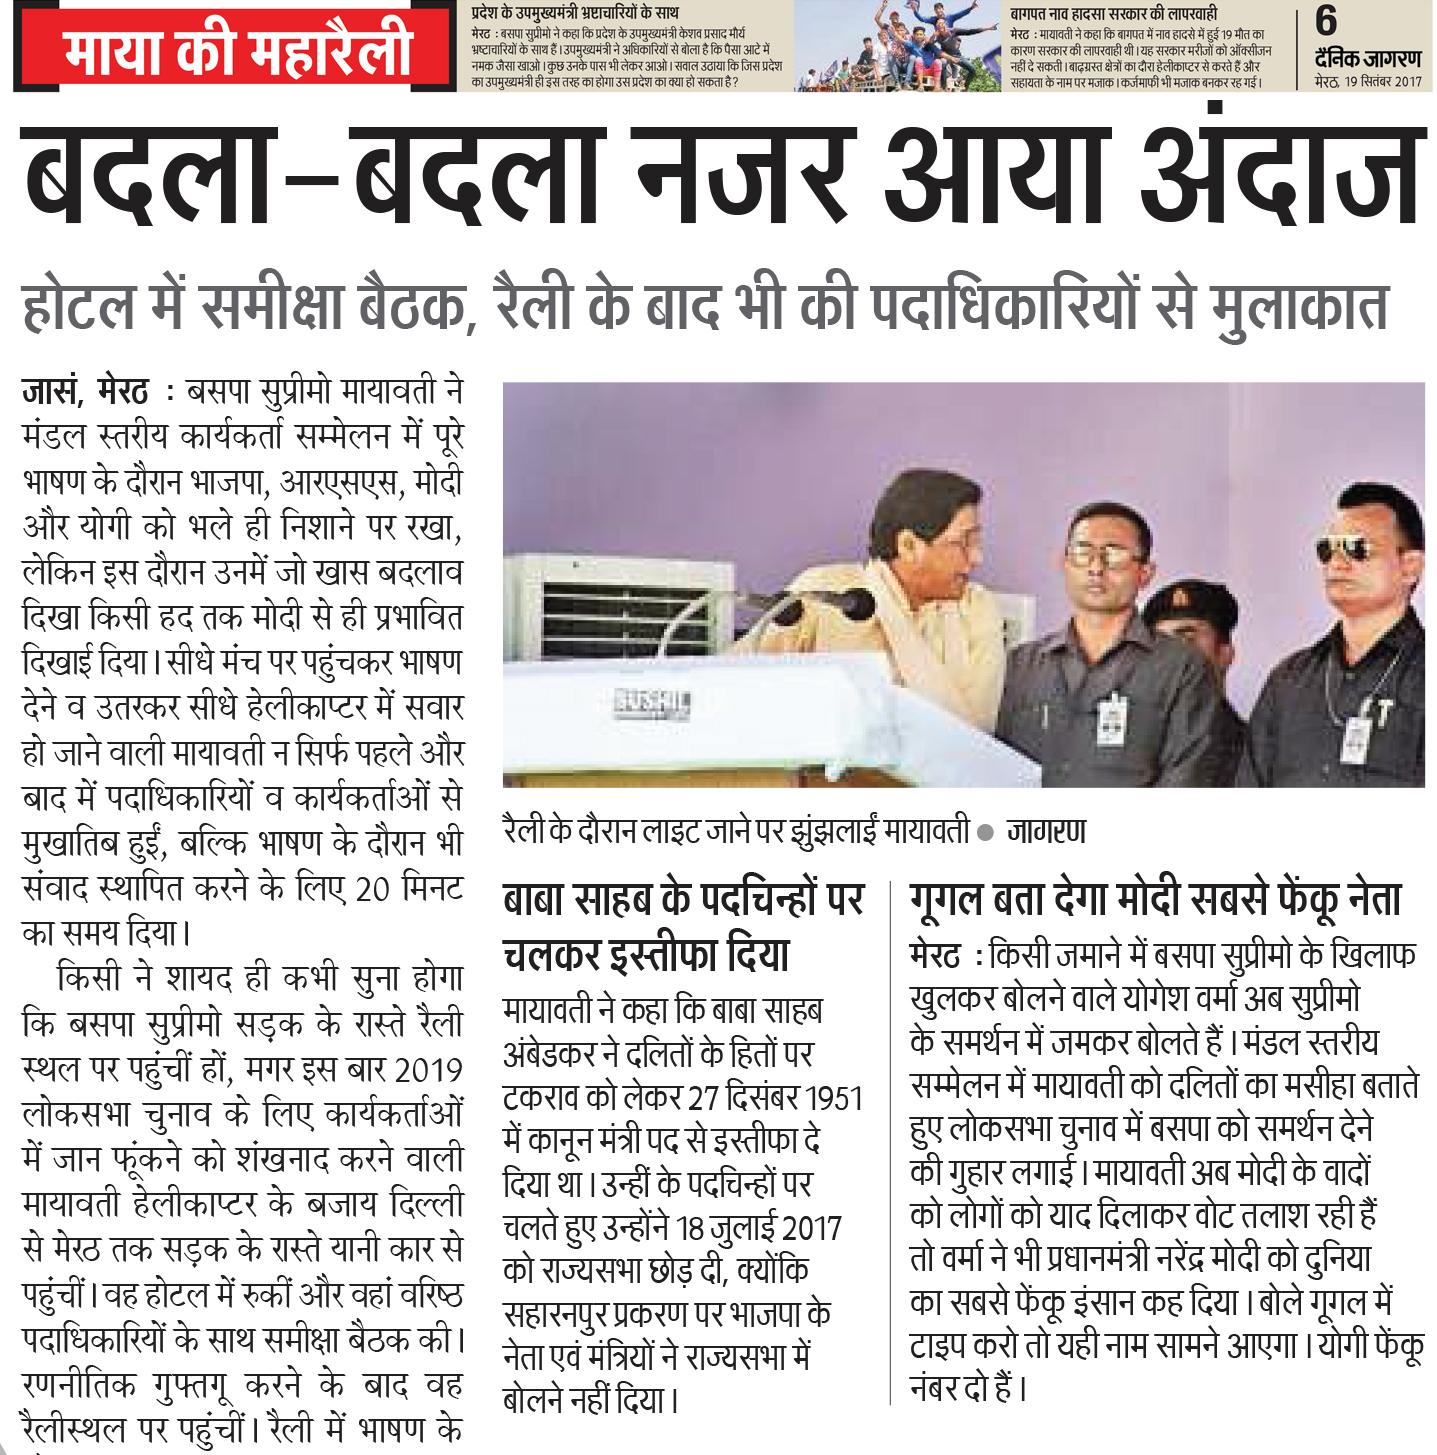 Dainik Jagran Bravura News